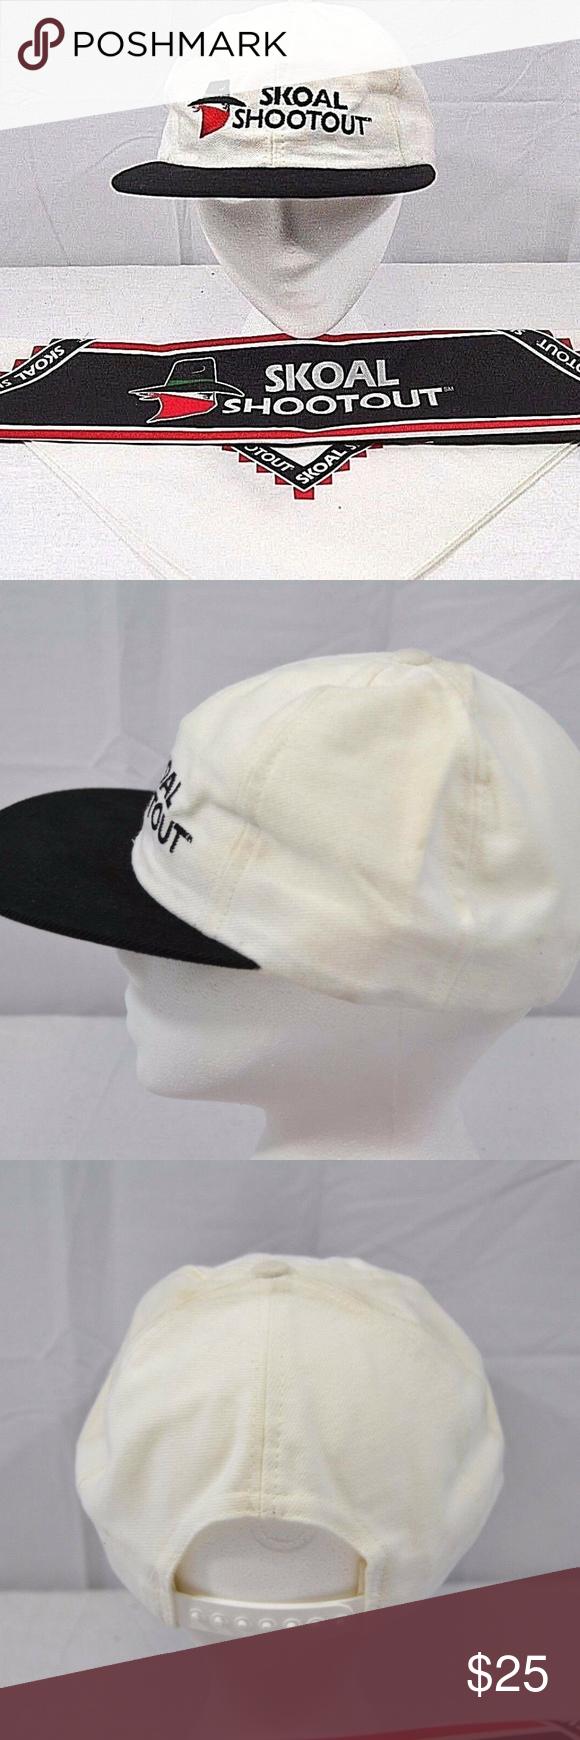 Skoal Shootout White Black Baseball Cap Snapback U Black Baseball Cap Black And White Man White And Black